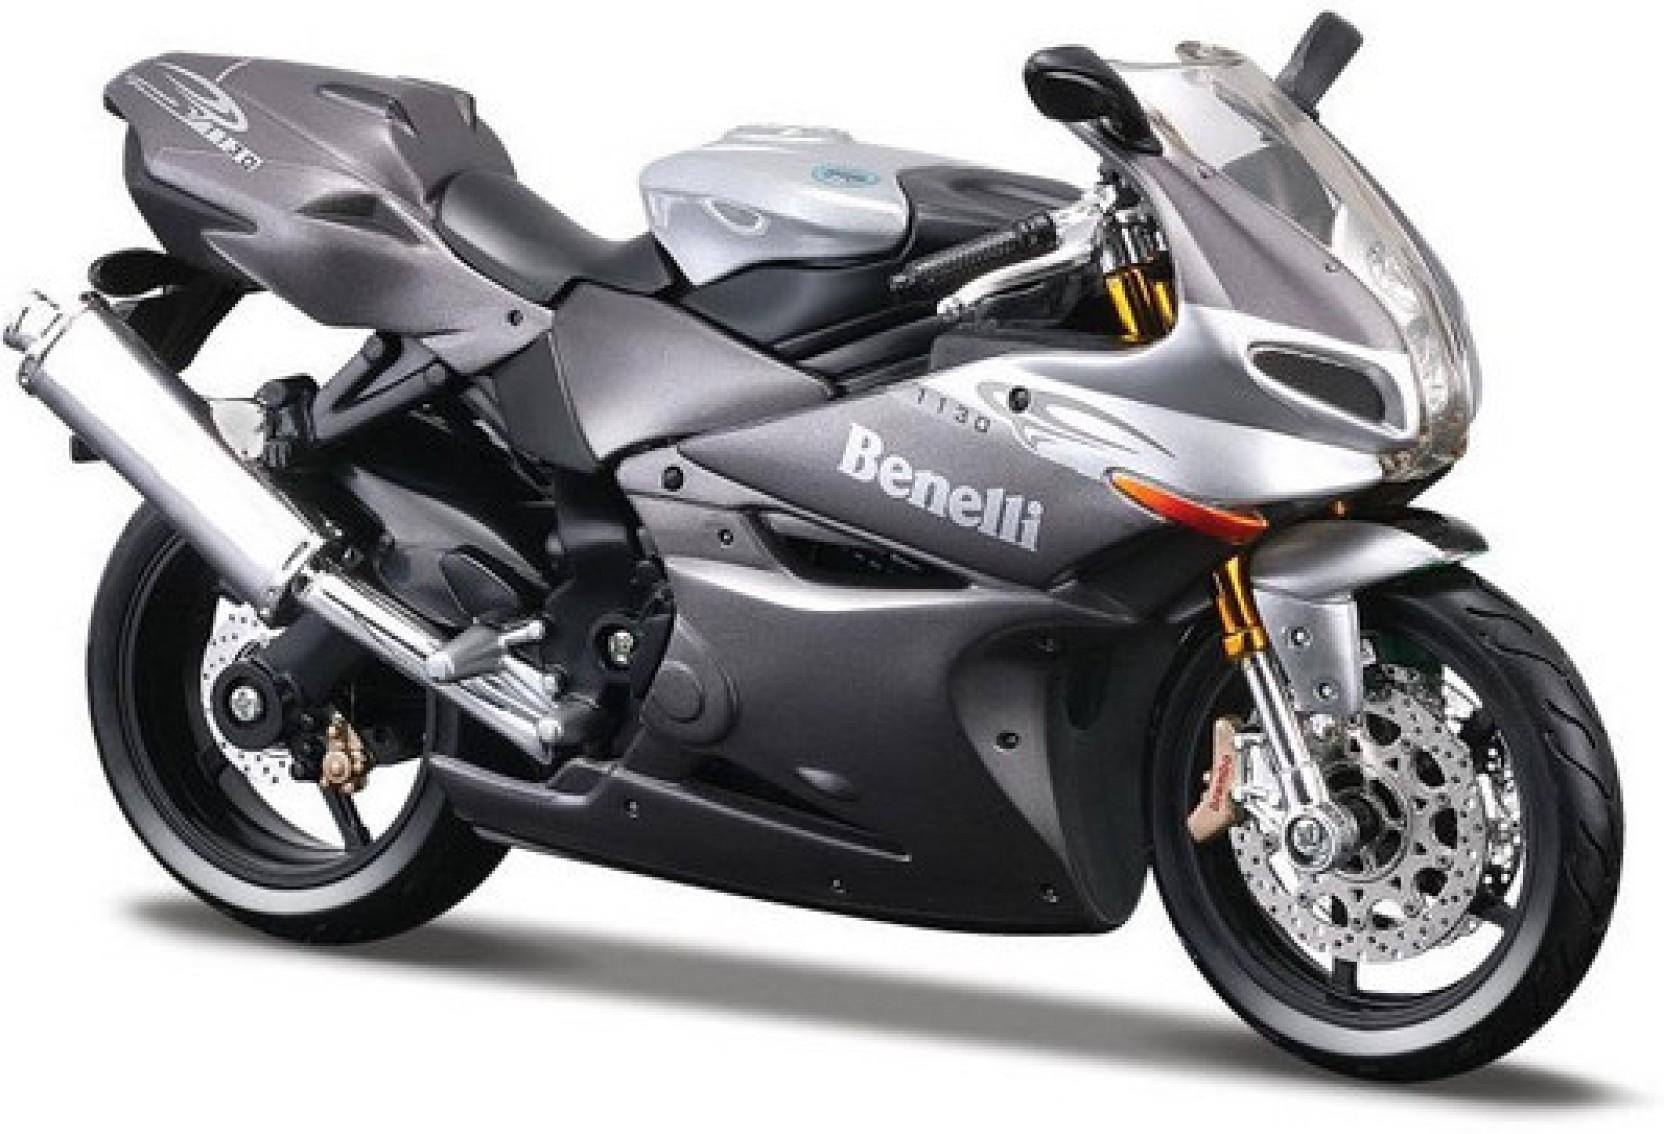 Maisto Benelli Tornado 1130 Bike Assembly Kit Benelli Tornado